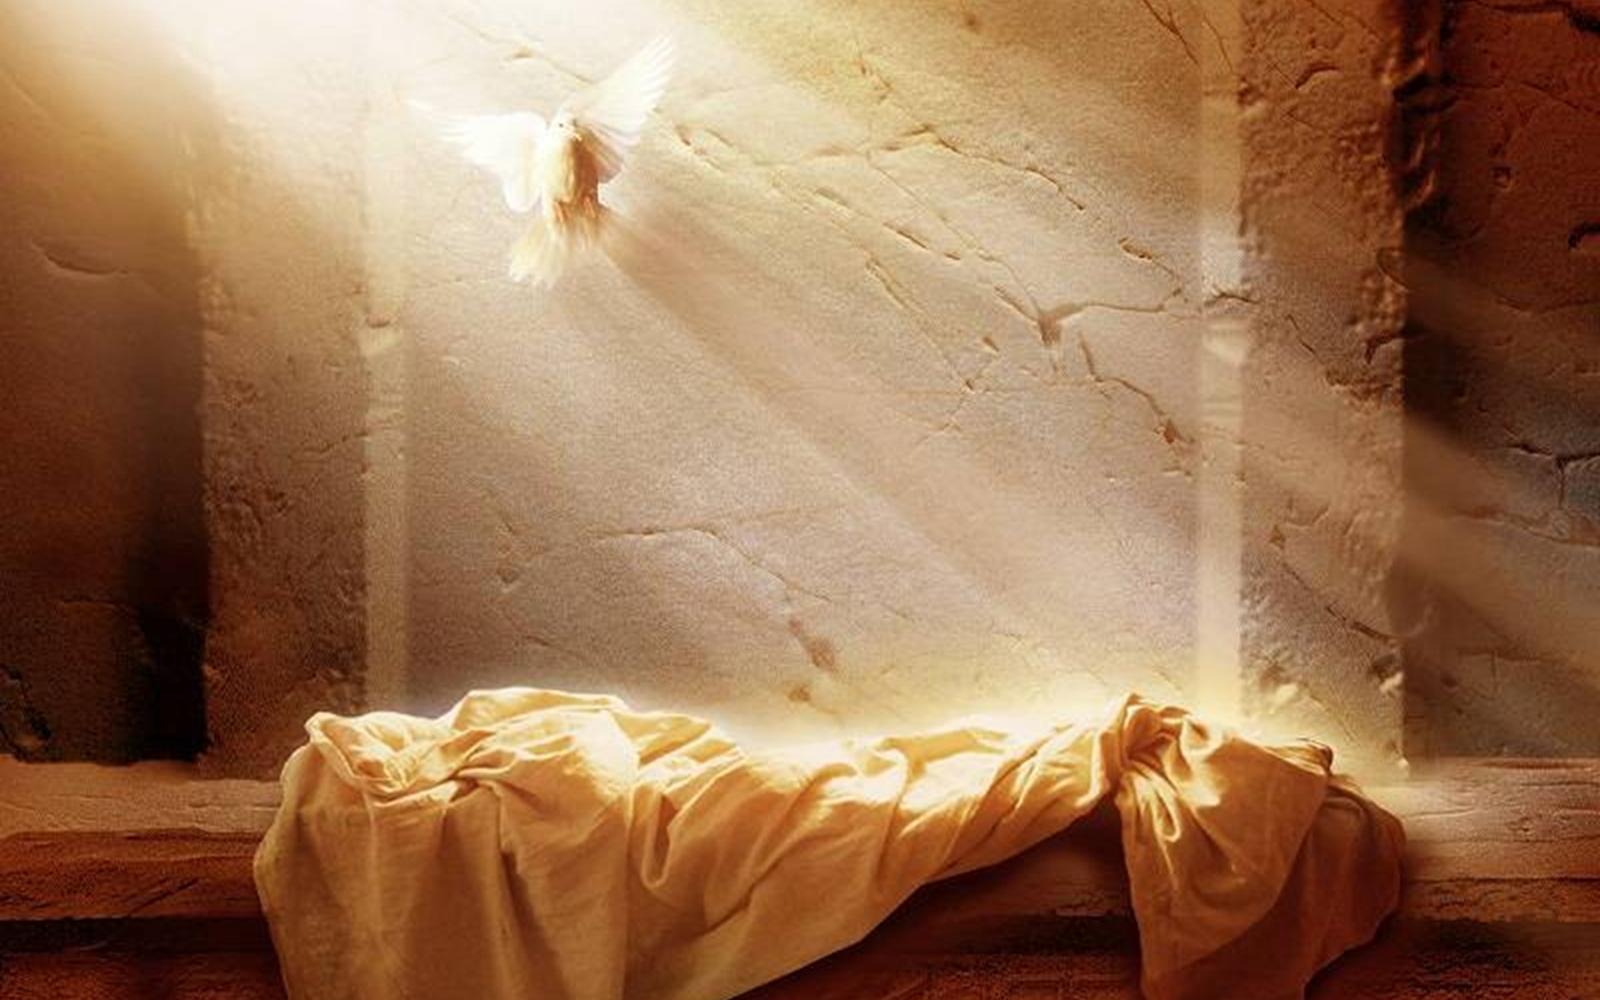 He is Risen sermon by Seth Johnson